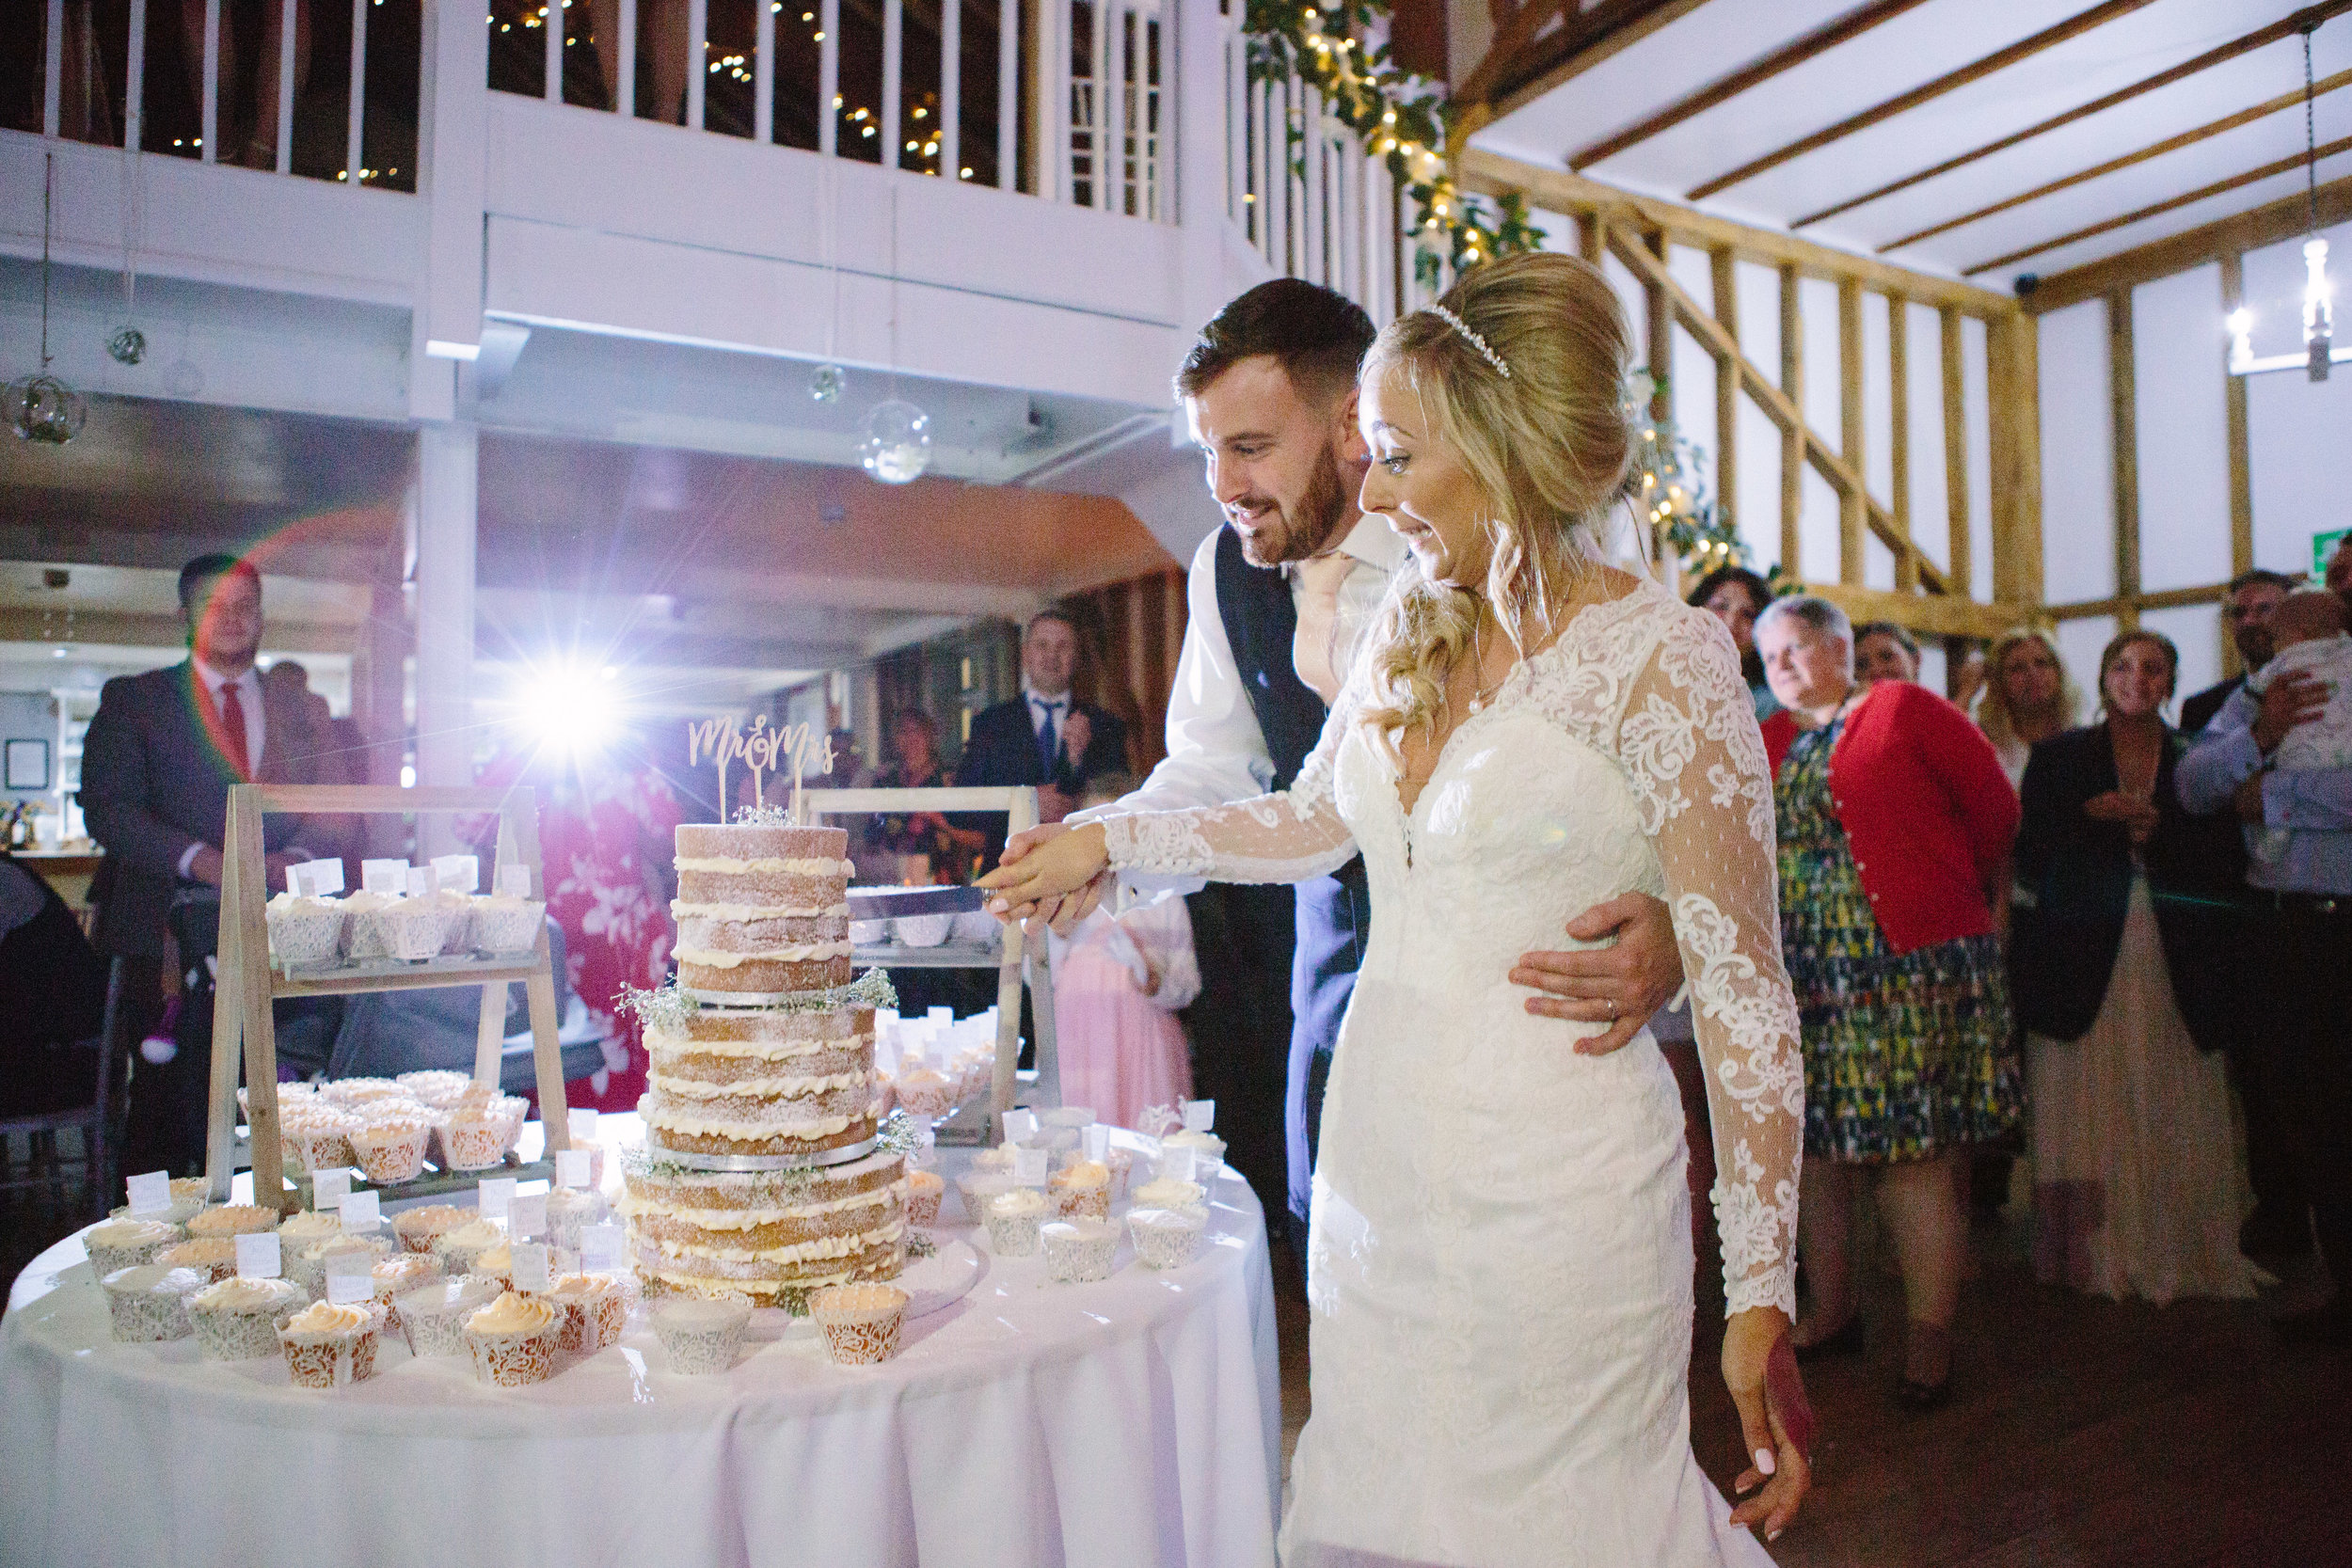 london-hertfordshire-wedding-photography-milling-barn-cake-73